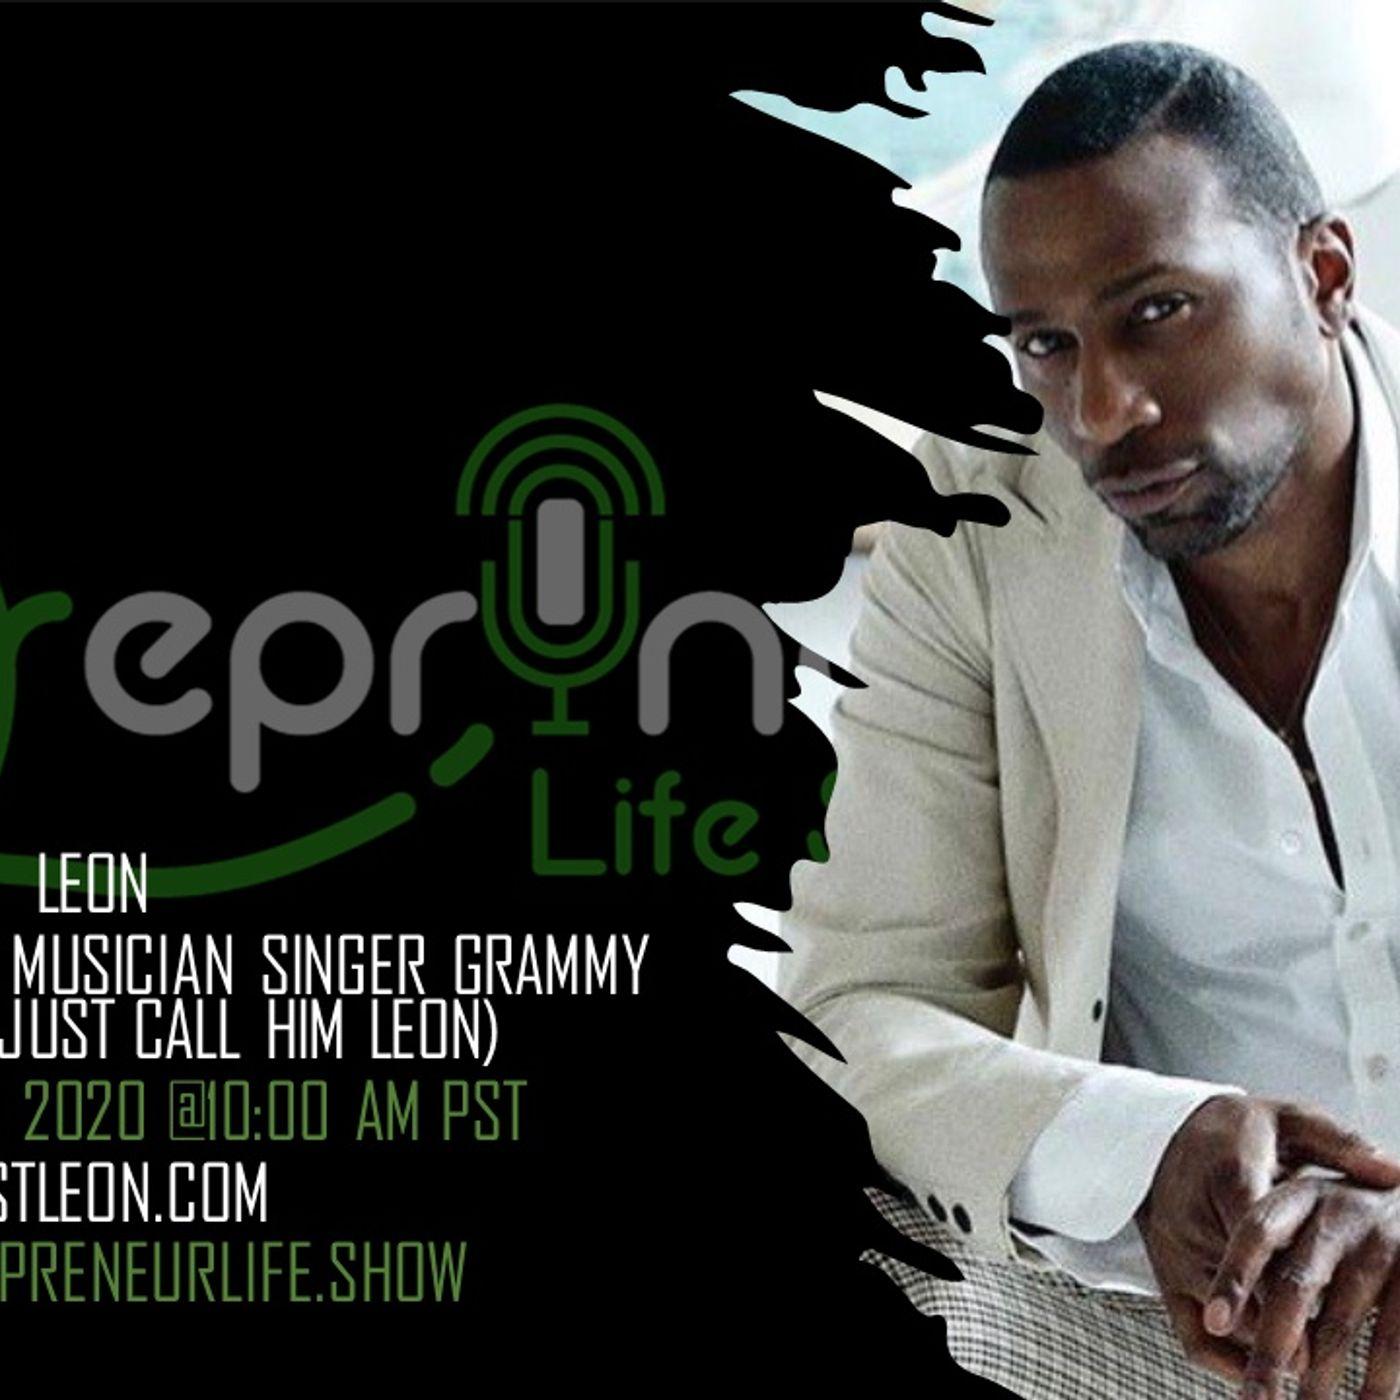 Leon Robinson Actor, Producer, Musician